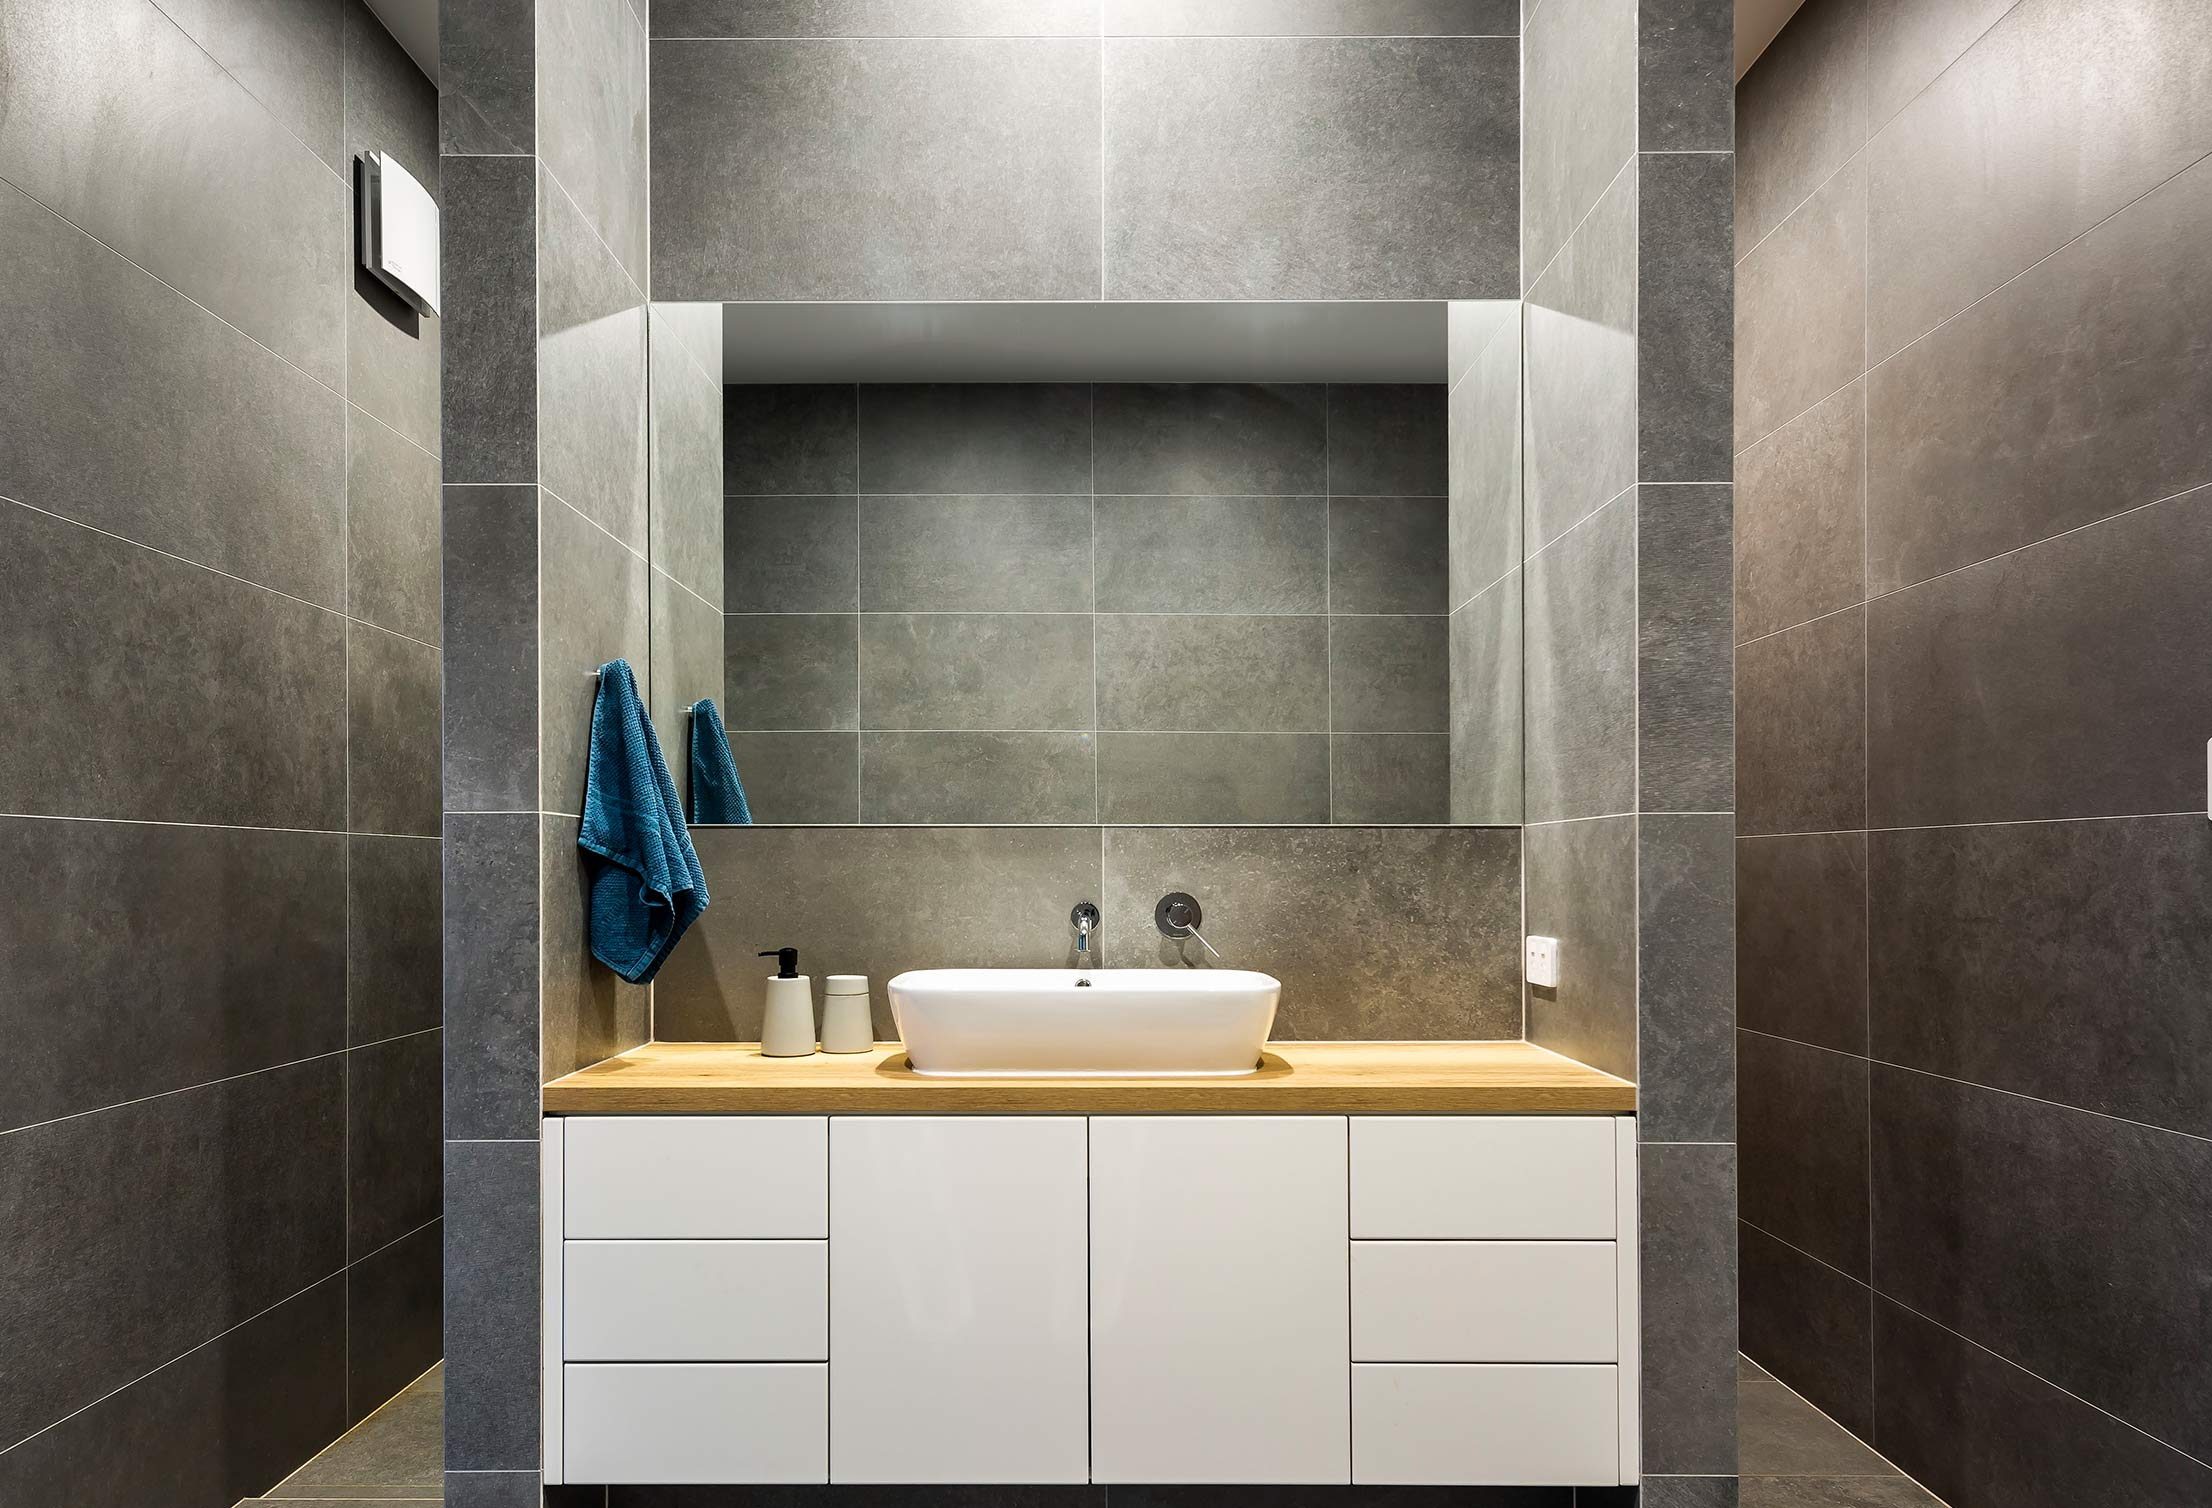 turnbull-built-renovation-bathroom-custom-kings-park-sa.jpg